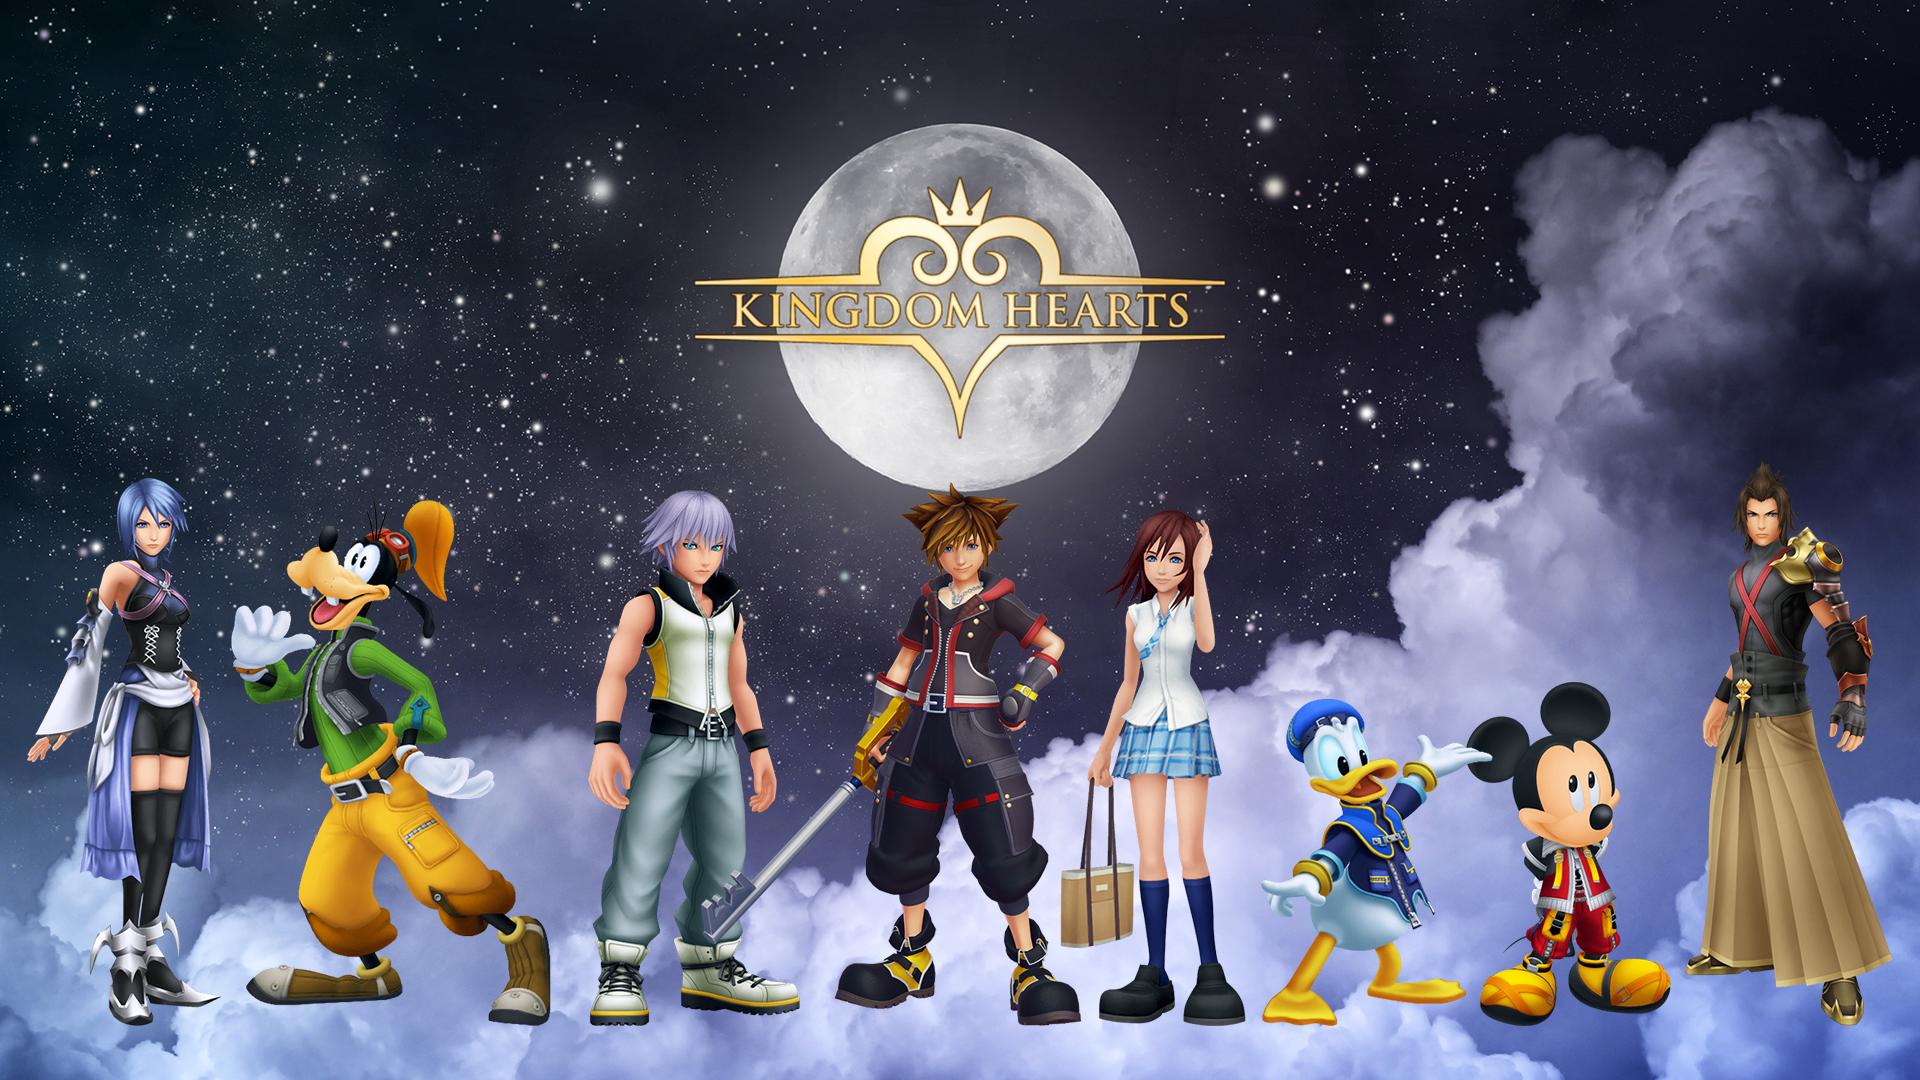 Kingdom Hearts Wallpaper By Denisninja 06 Hd Wallpaper Hintergrund